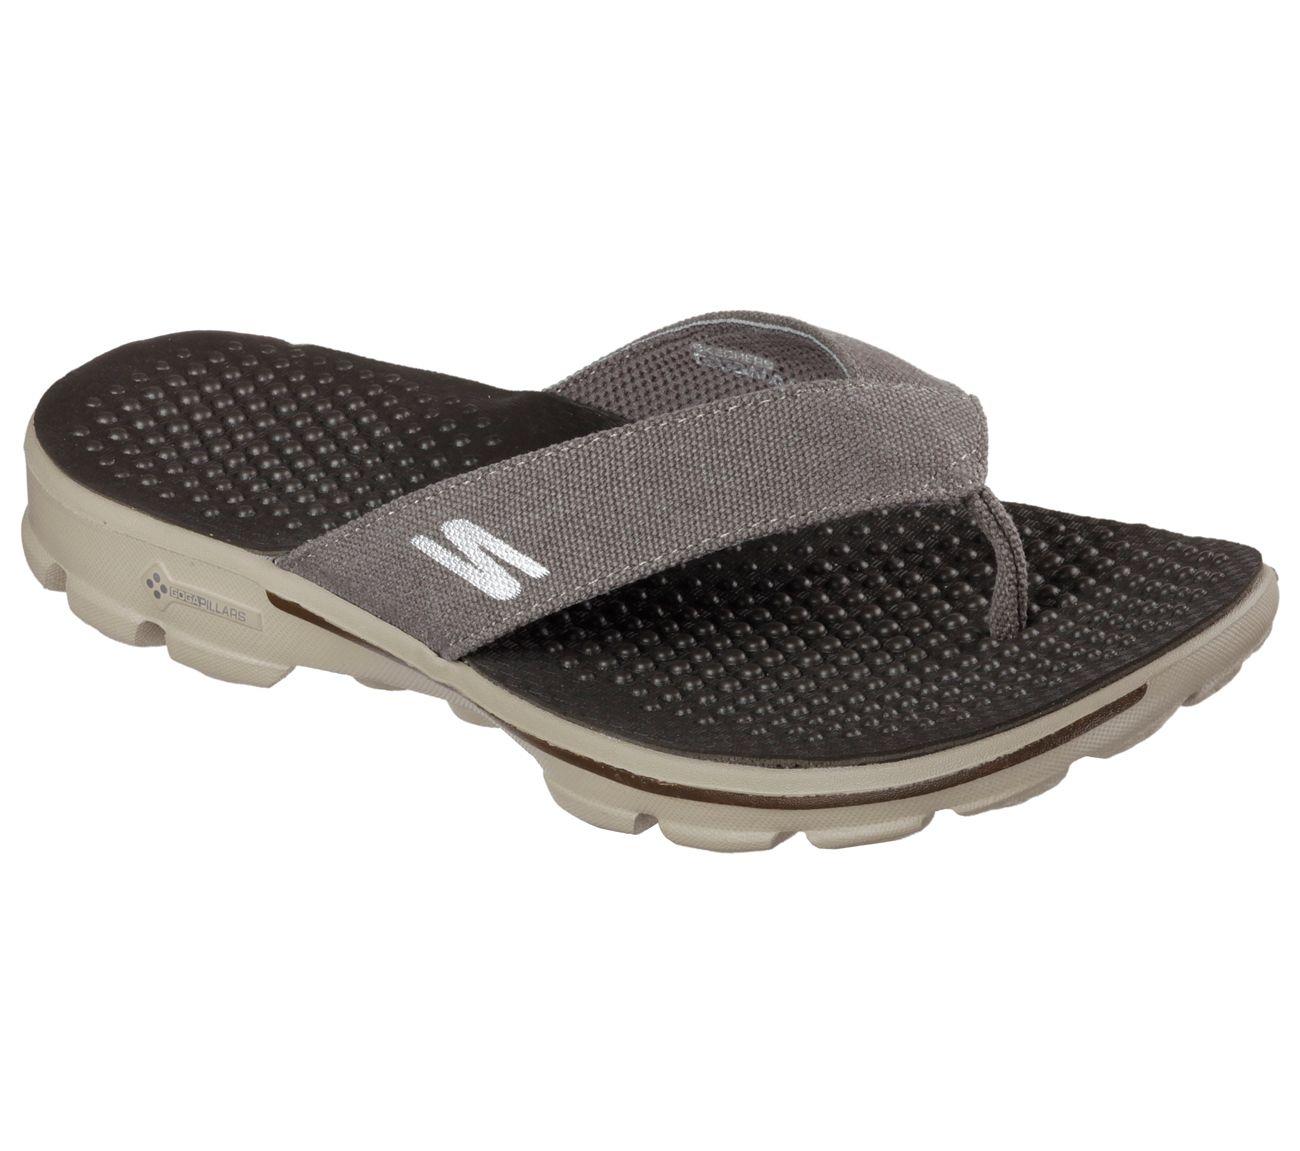 check out 60% cheap elegant shoes GOwalk 3 - Wind Surf | Mens skechers, Skechers, Sandals